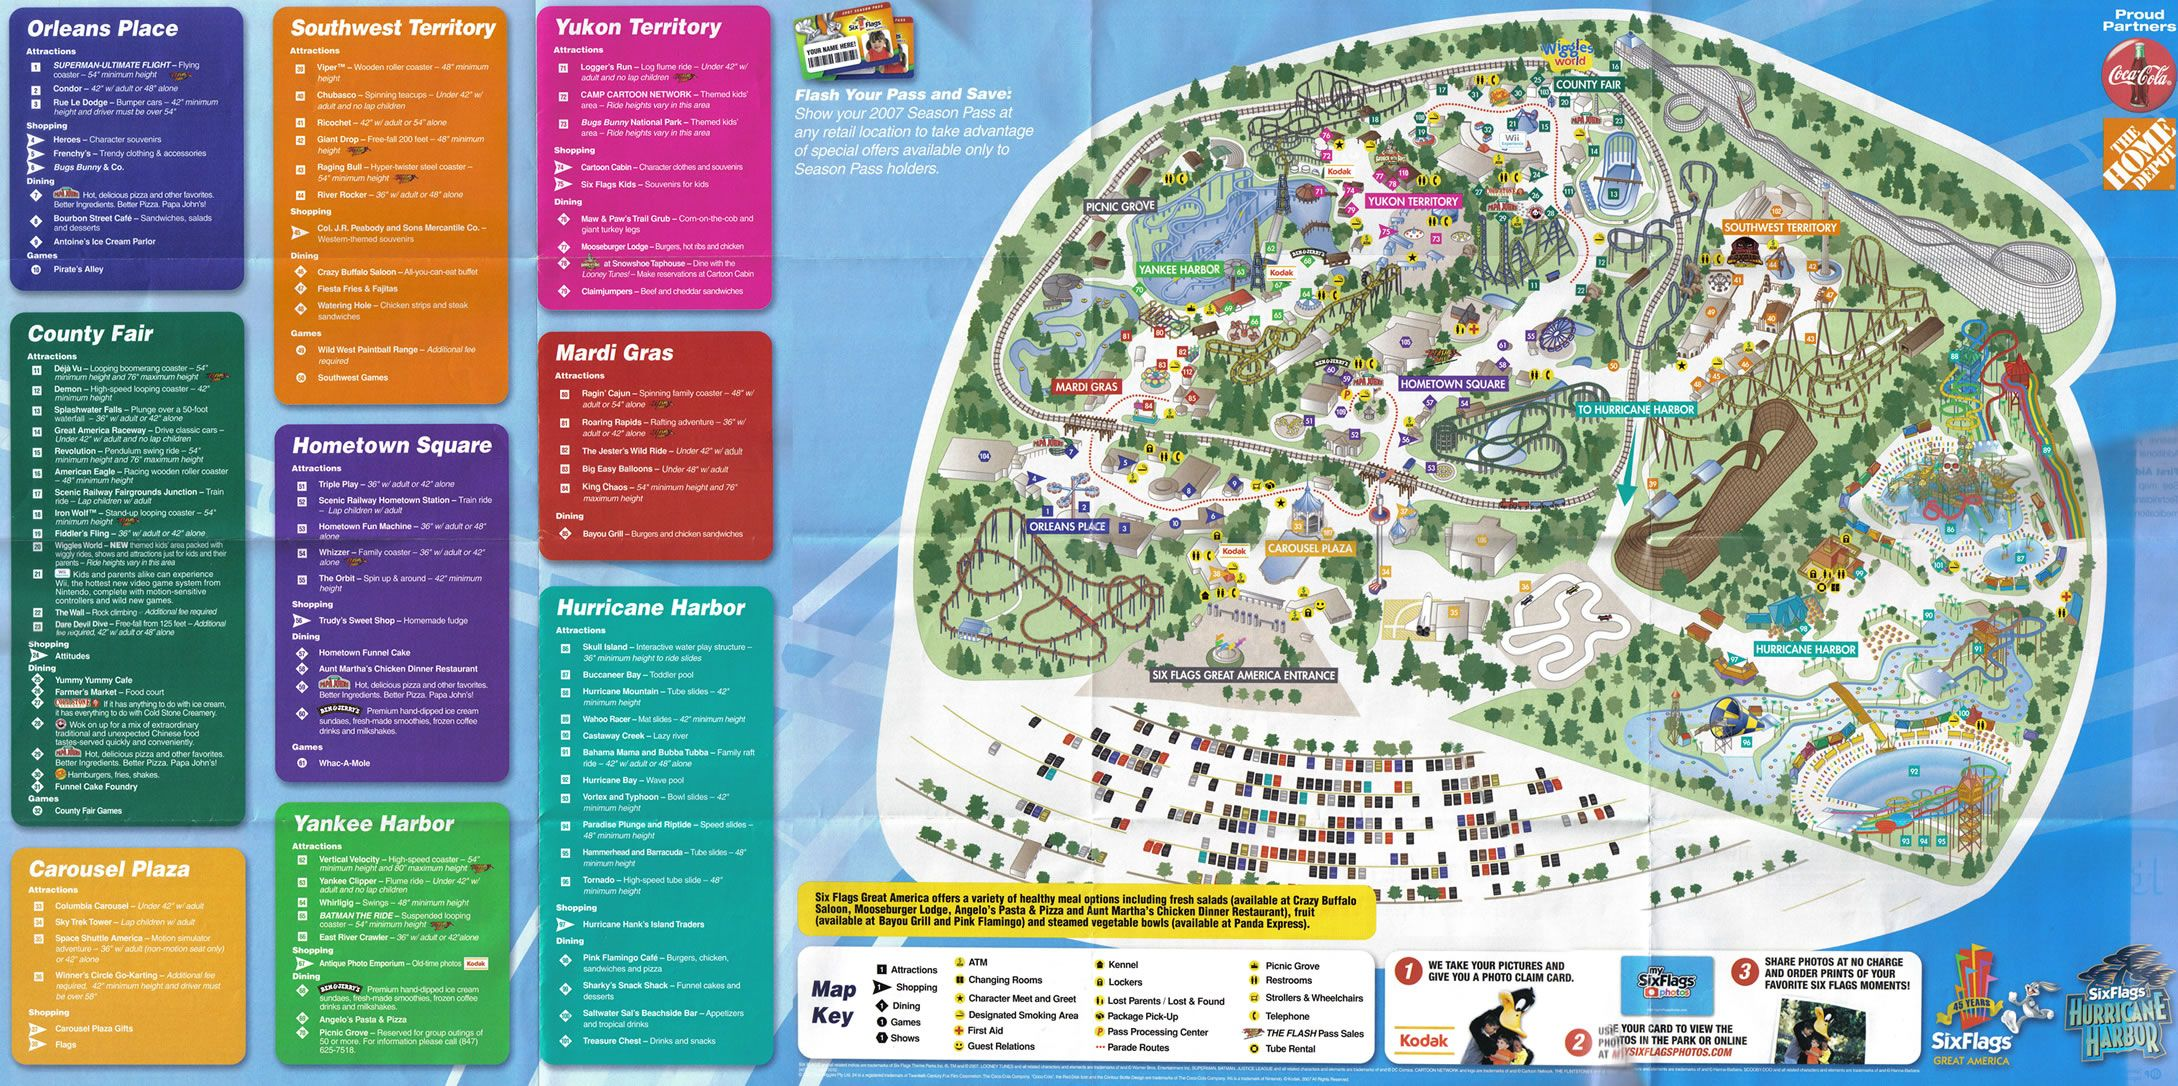 Great America Six Flags Great America Theme Park Map Theme Park Map Great America America Theme